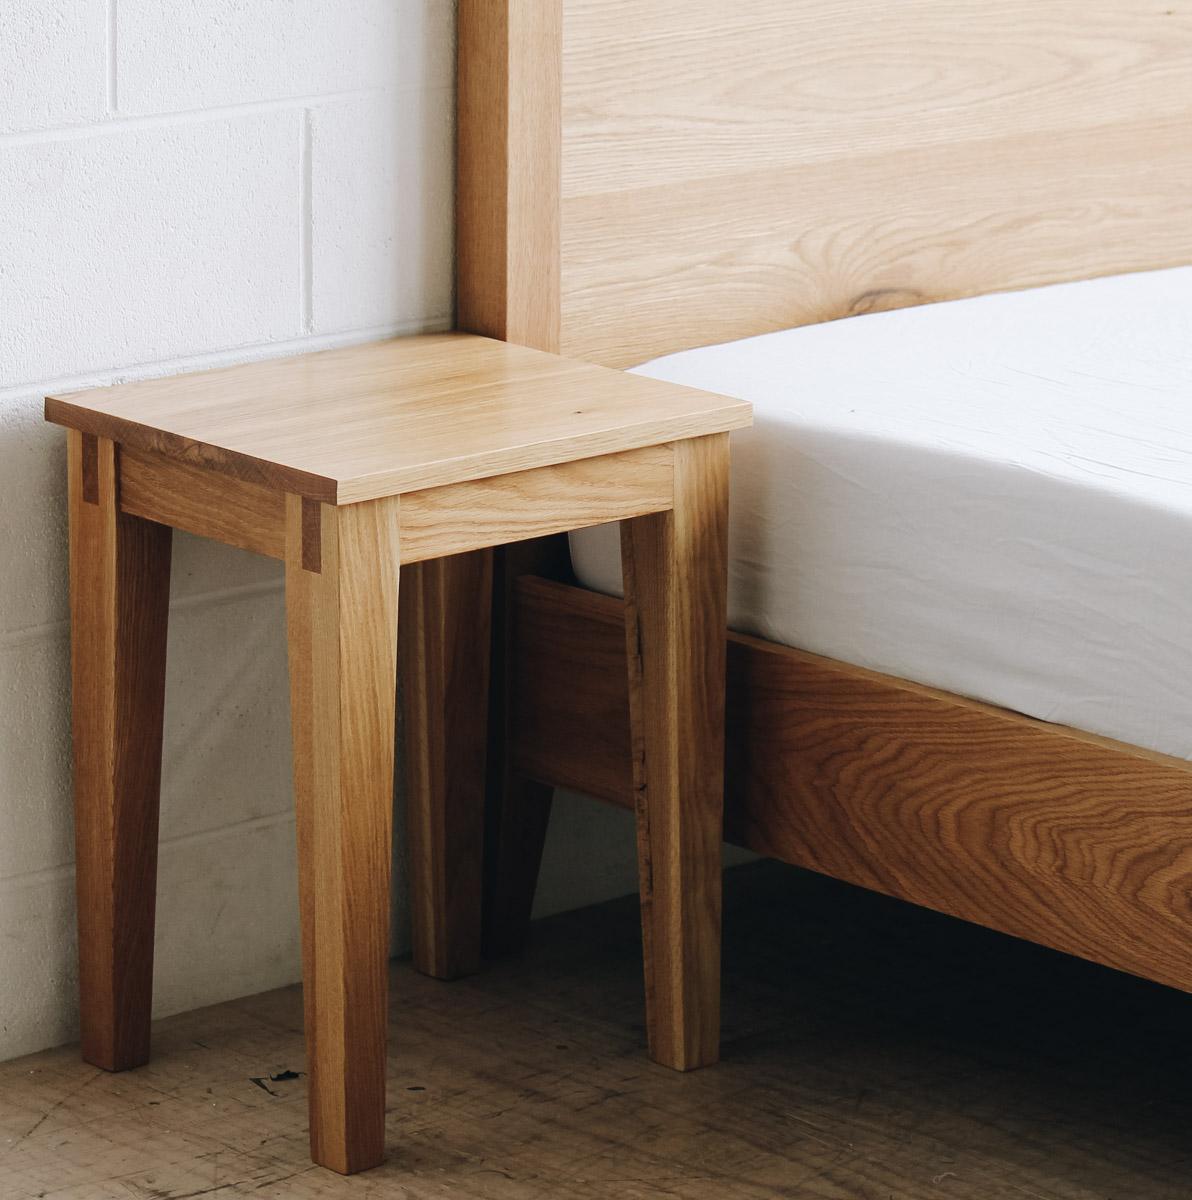 AL and Imo Handmade - Tall Scandi - custom American Oak timber bedframe - Surf Coast - Melbourne - Victoria - Australia-99.jpg